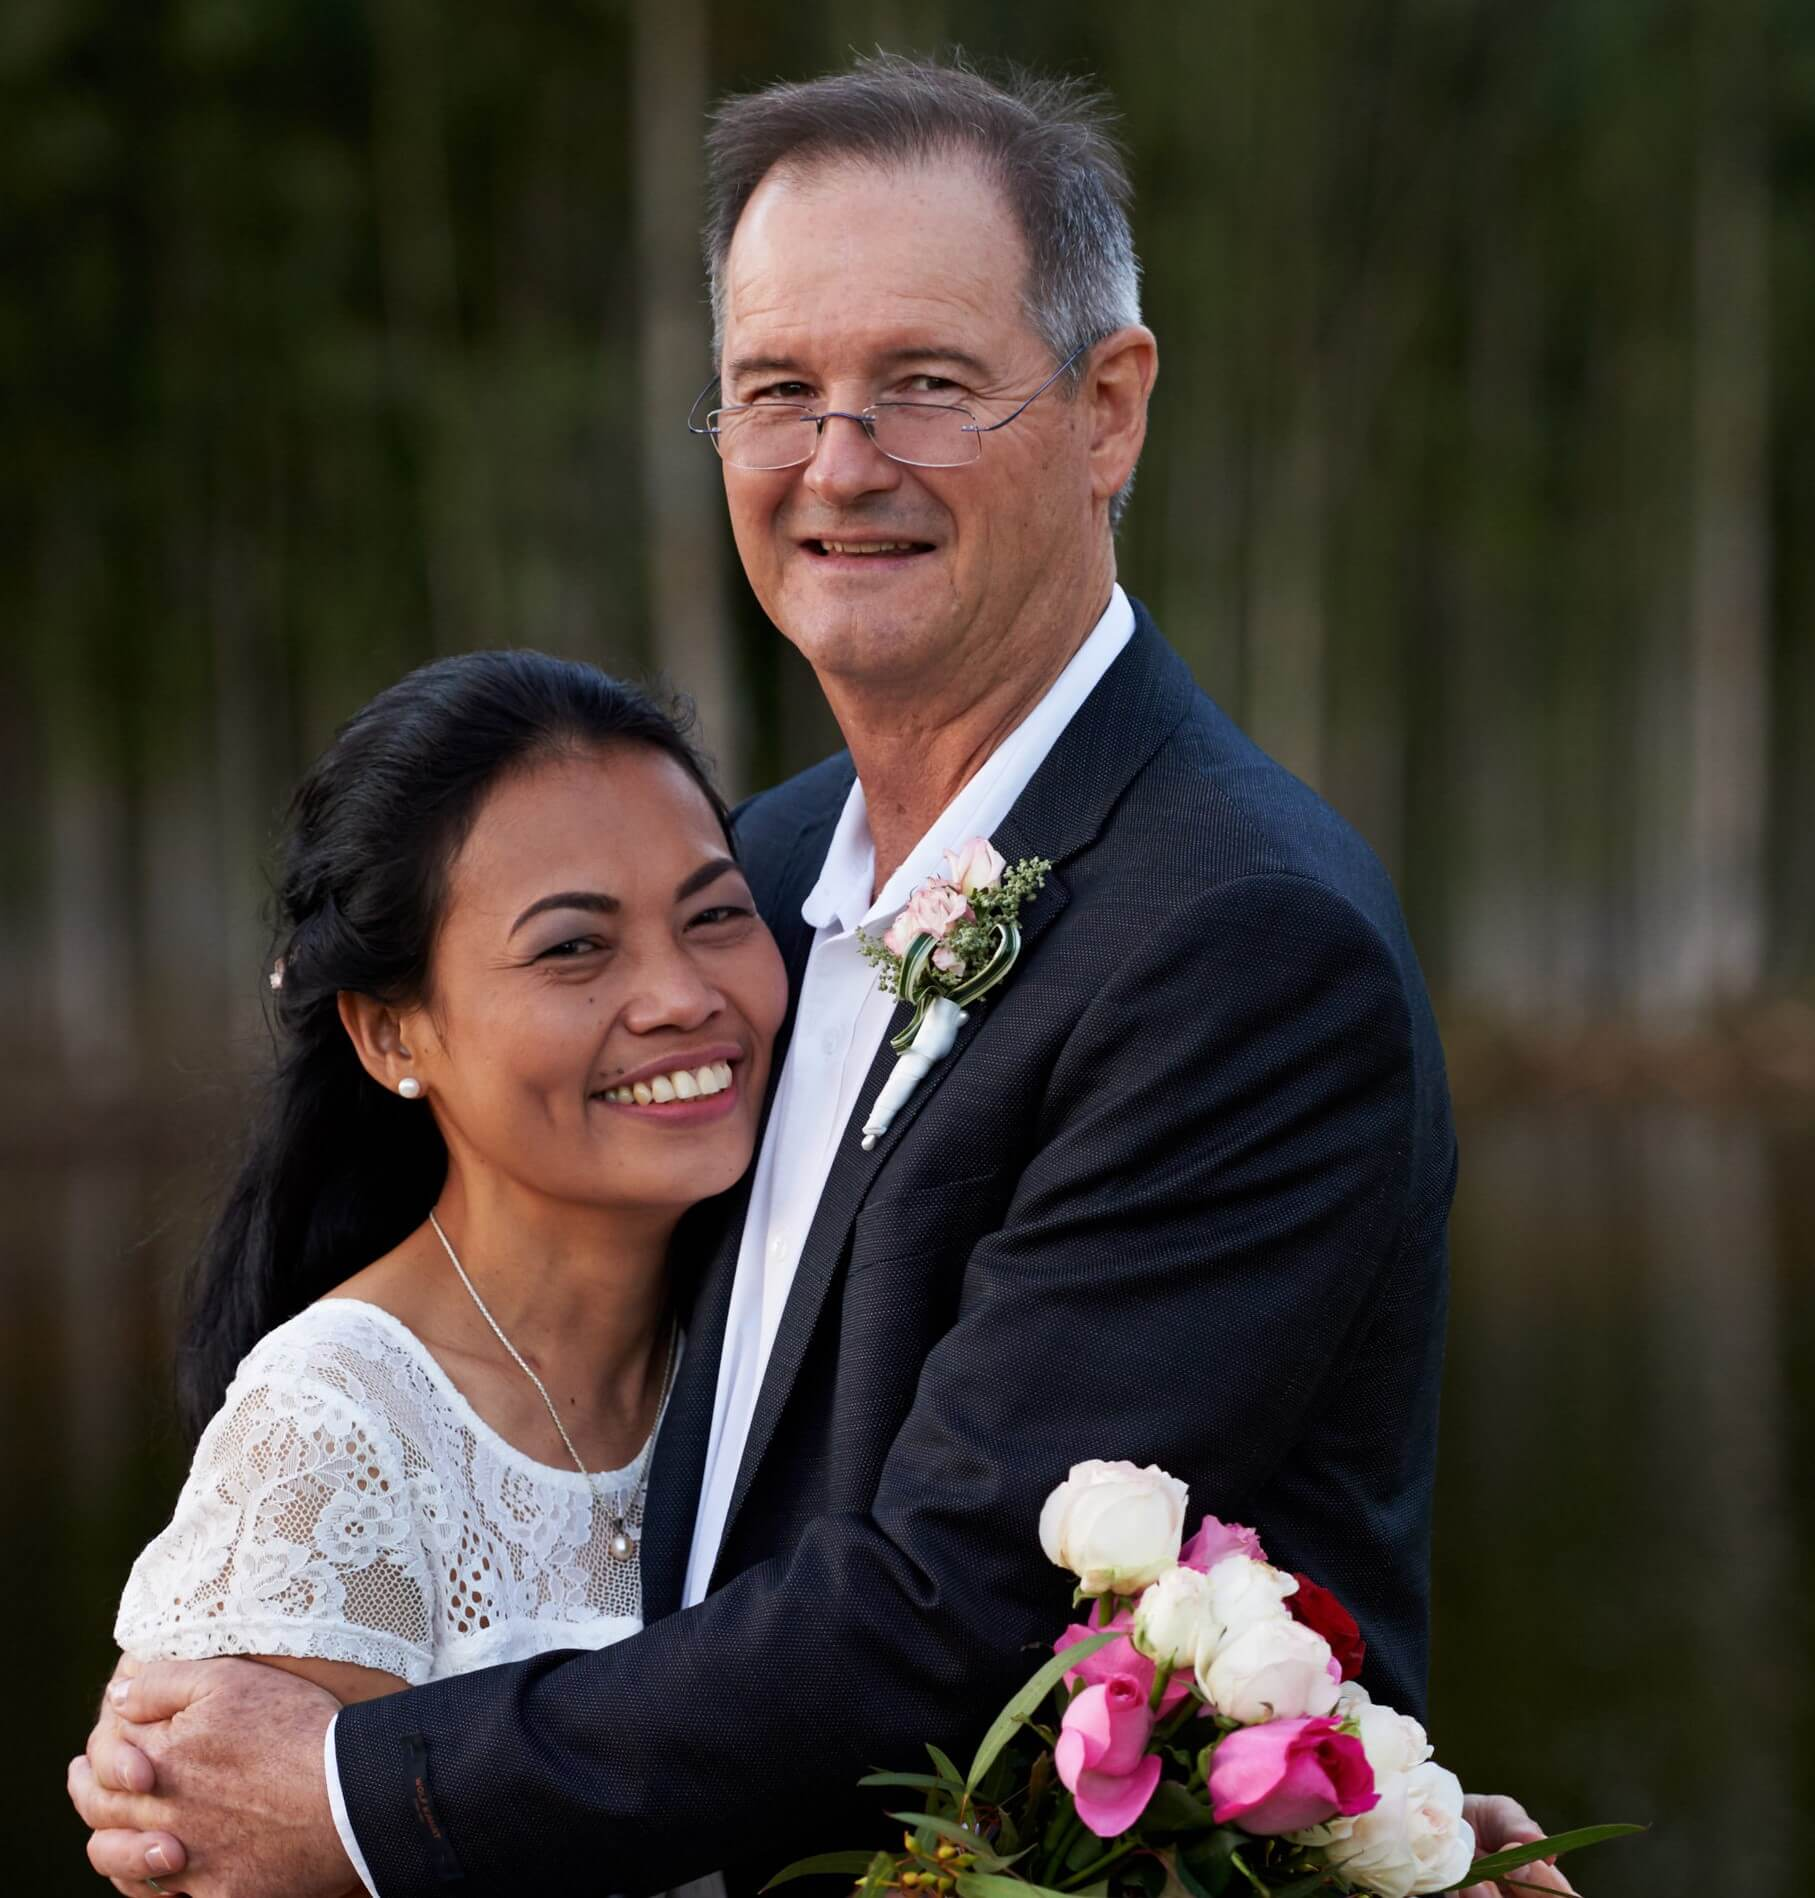 https://www.lovebirdceremonies.com.au/wp-content/uploads/2020/07/Chris-Rosie.jpg